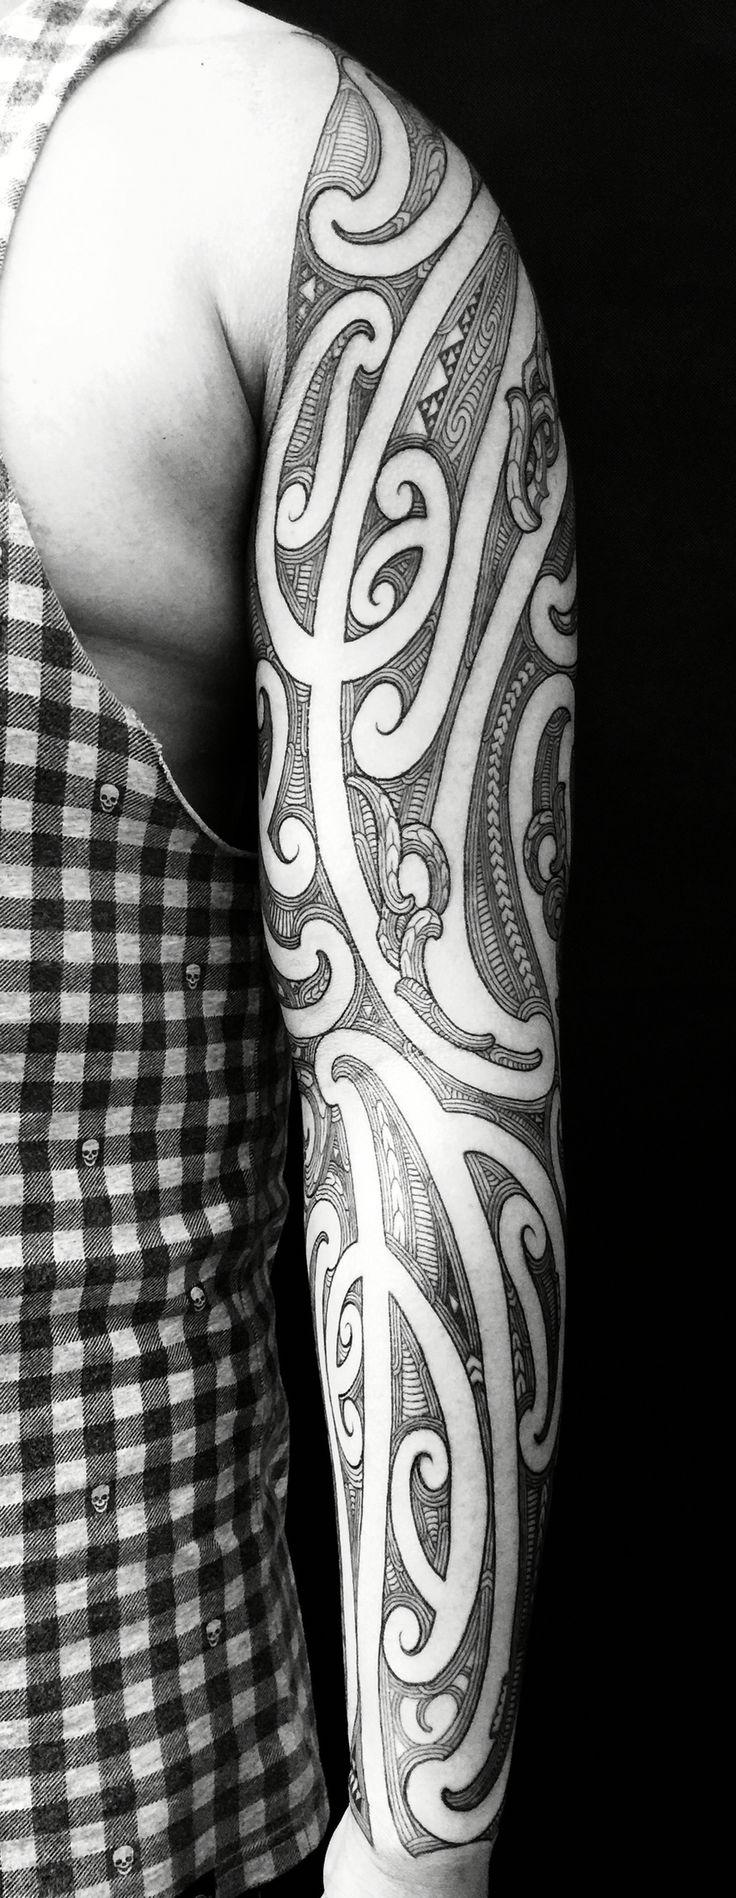 Moko sleeve by Wiremu Barriball